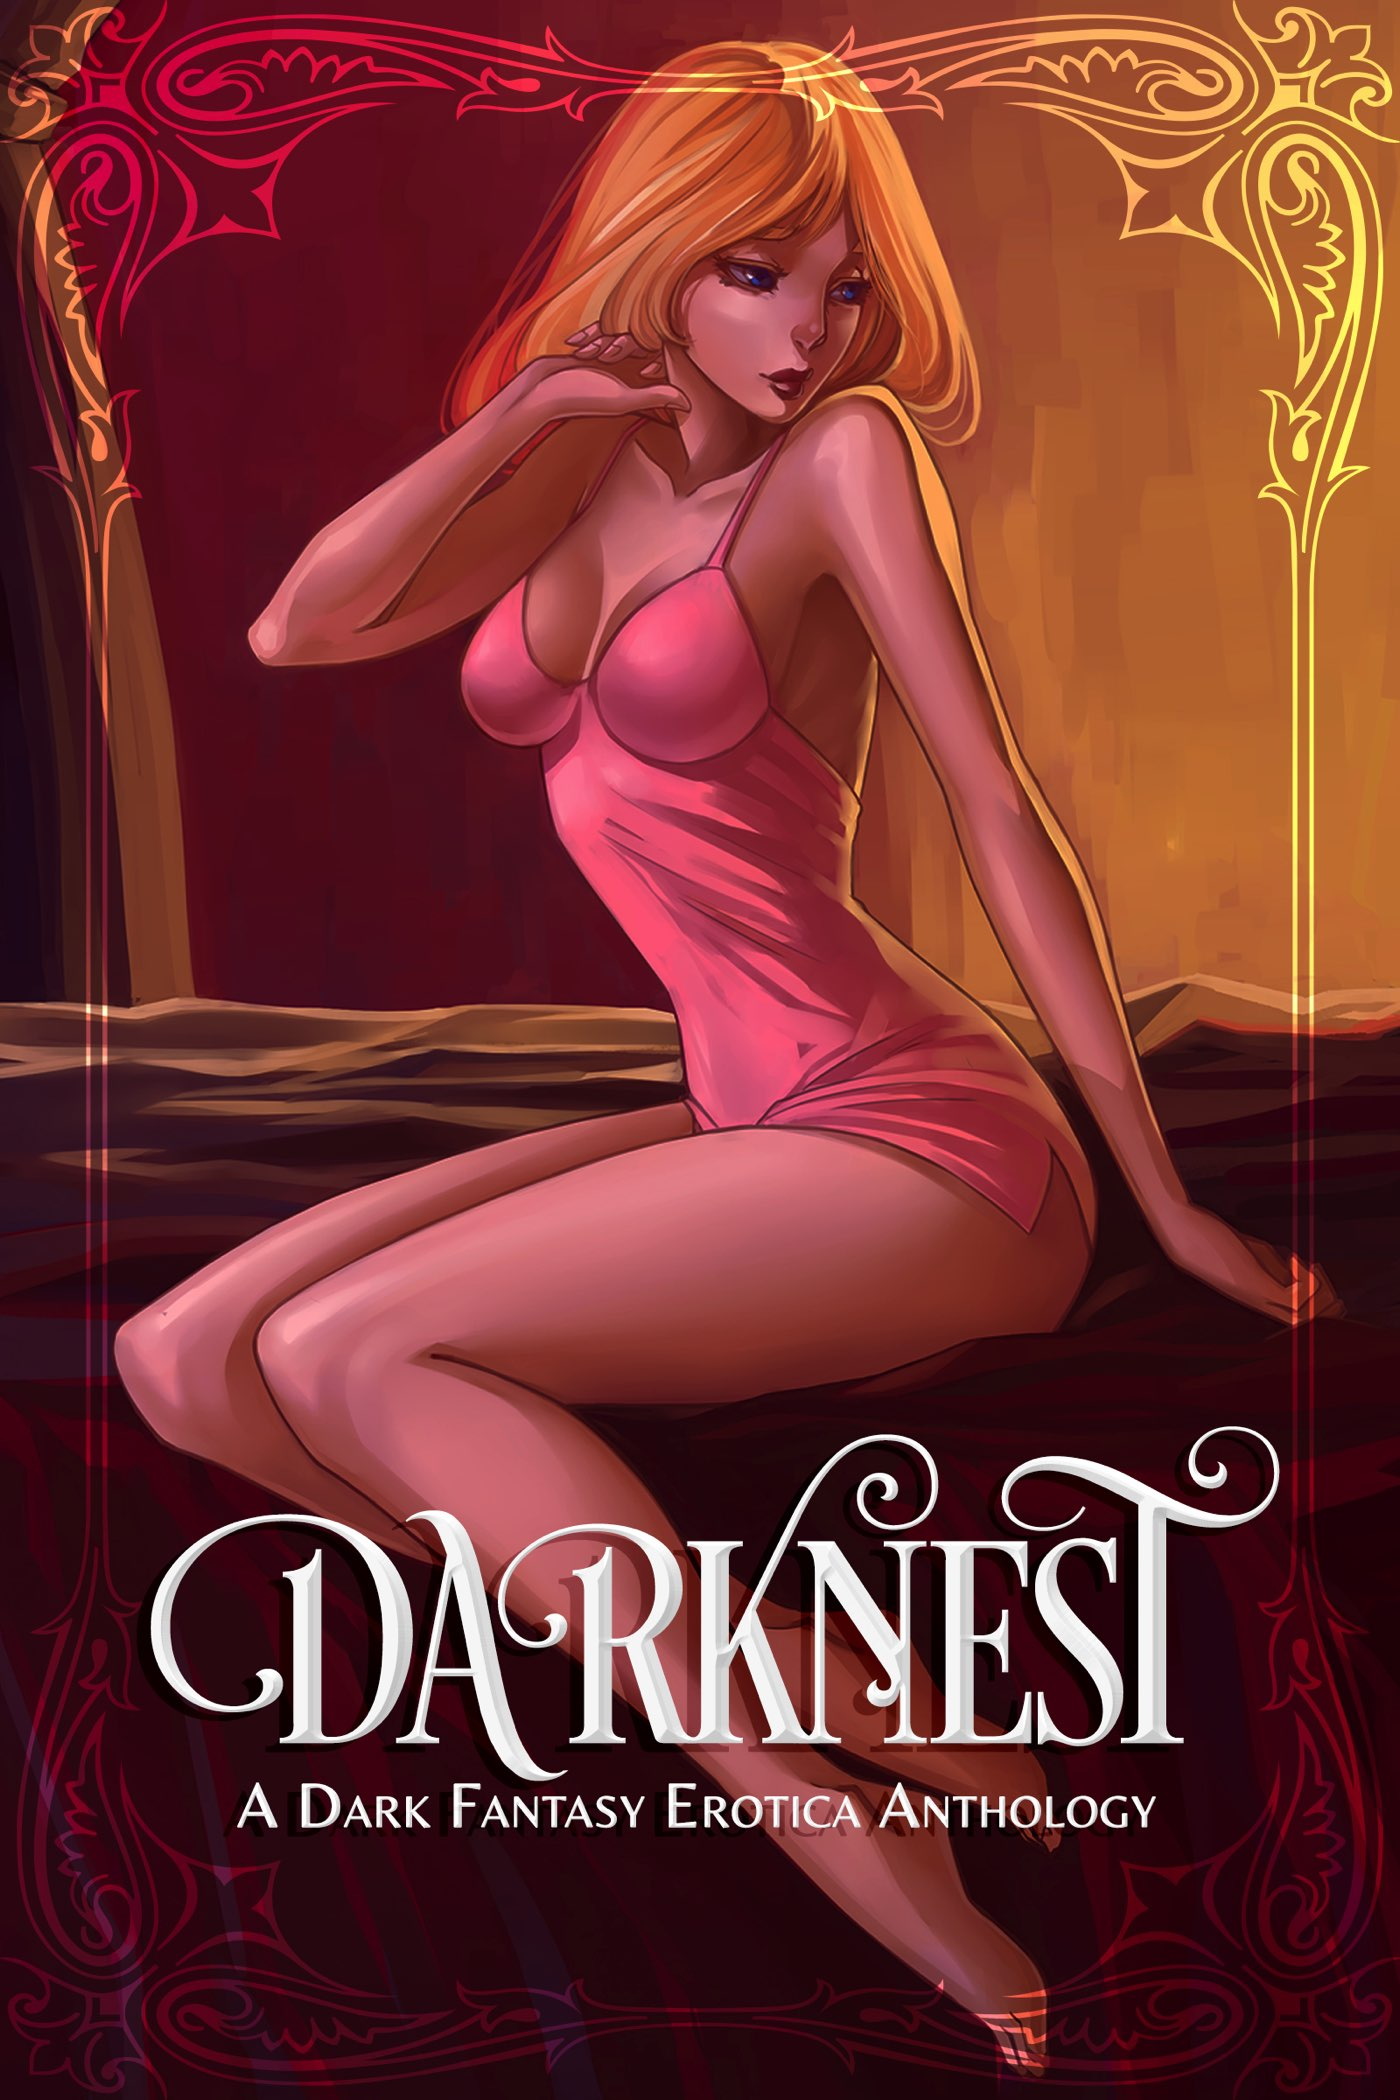 Dark fantasy erotic erotic image